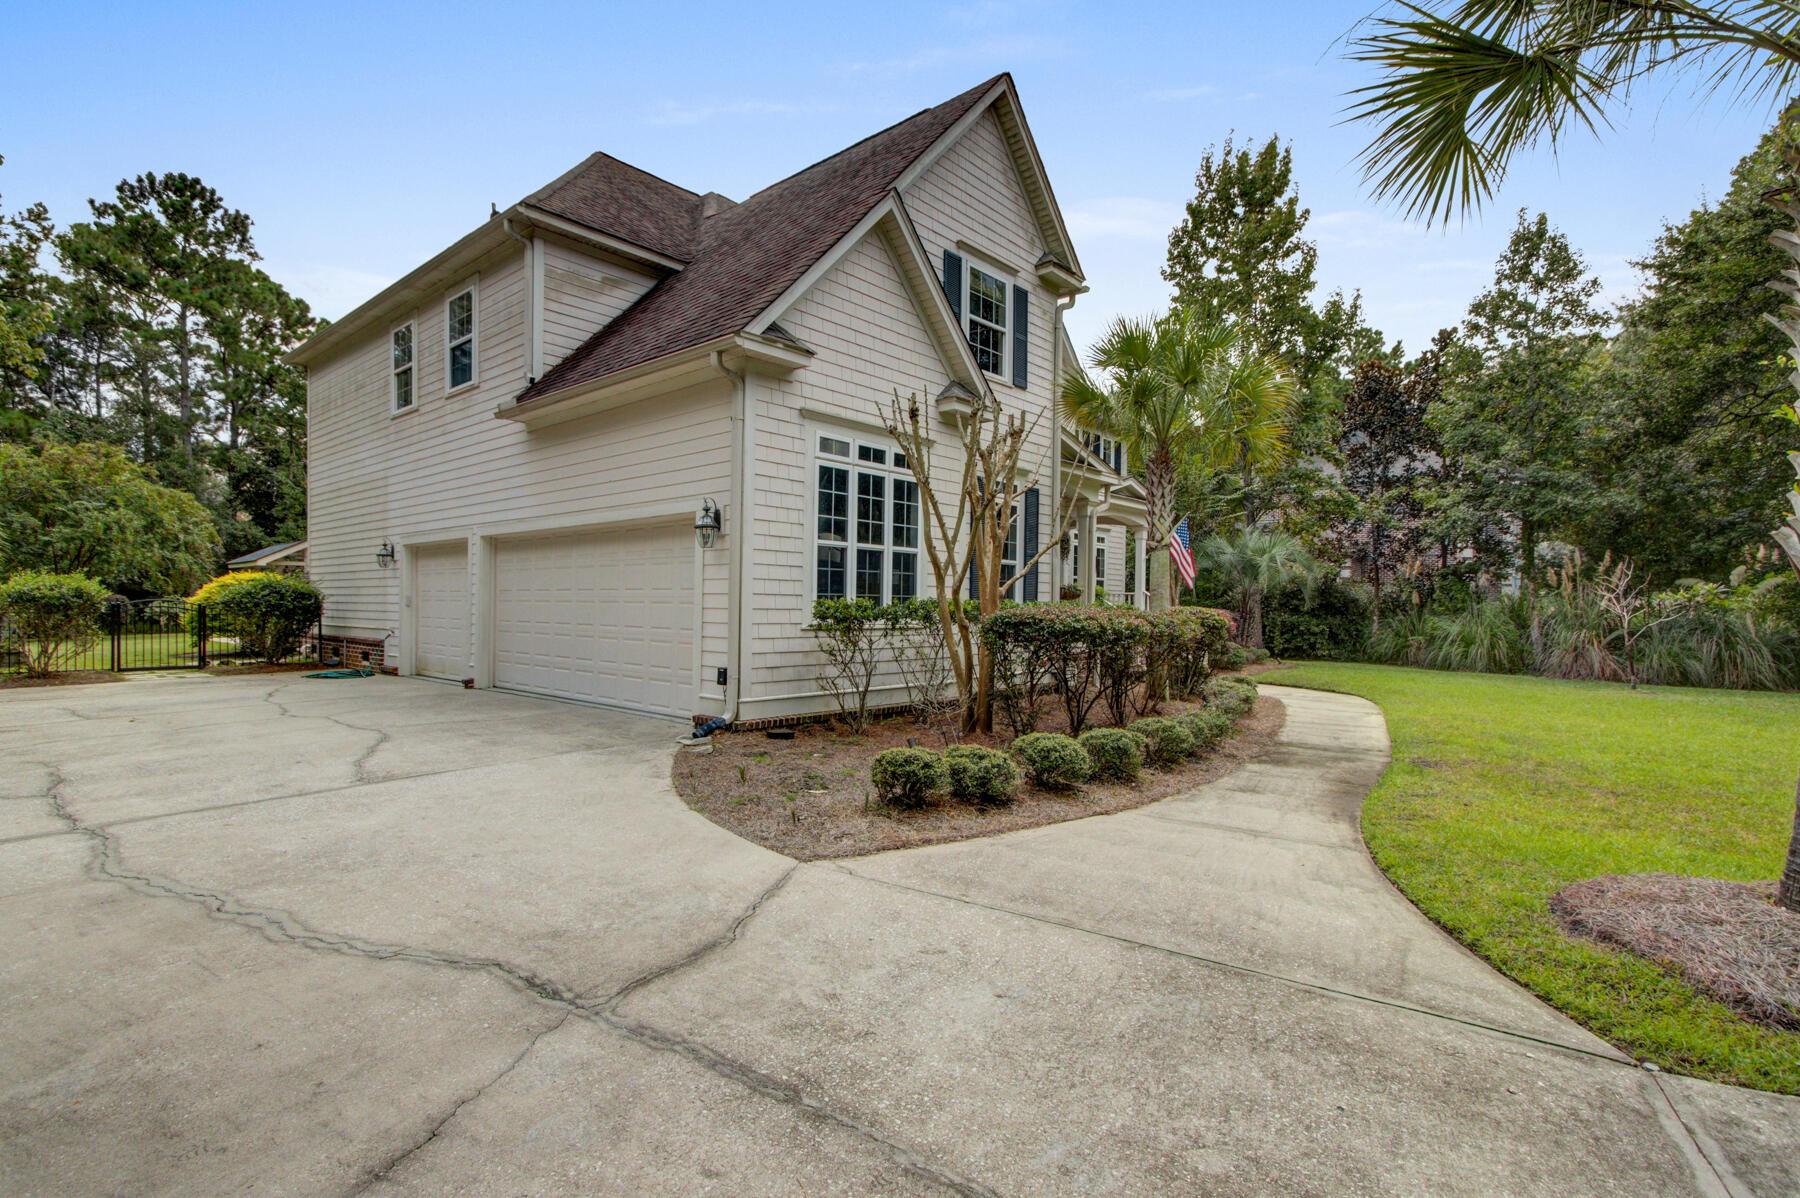 Dunes West Homes For Sale - 3095 Pignatelli, Mount Pleasant, SC - 0